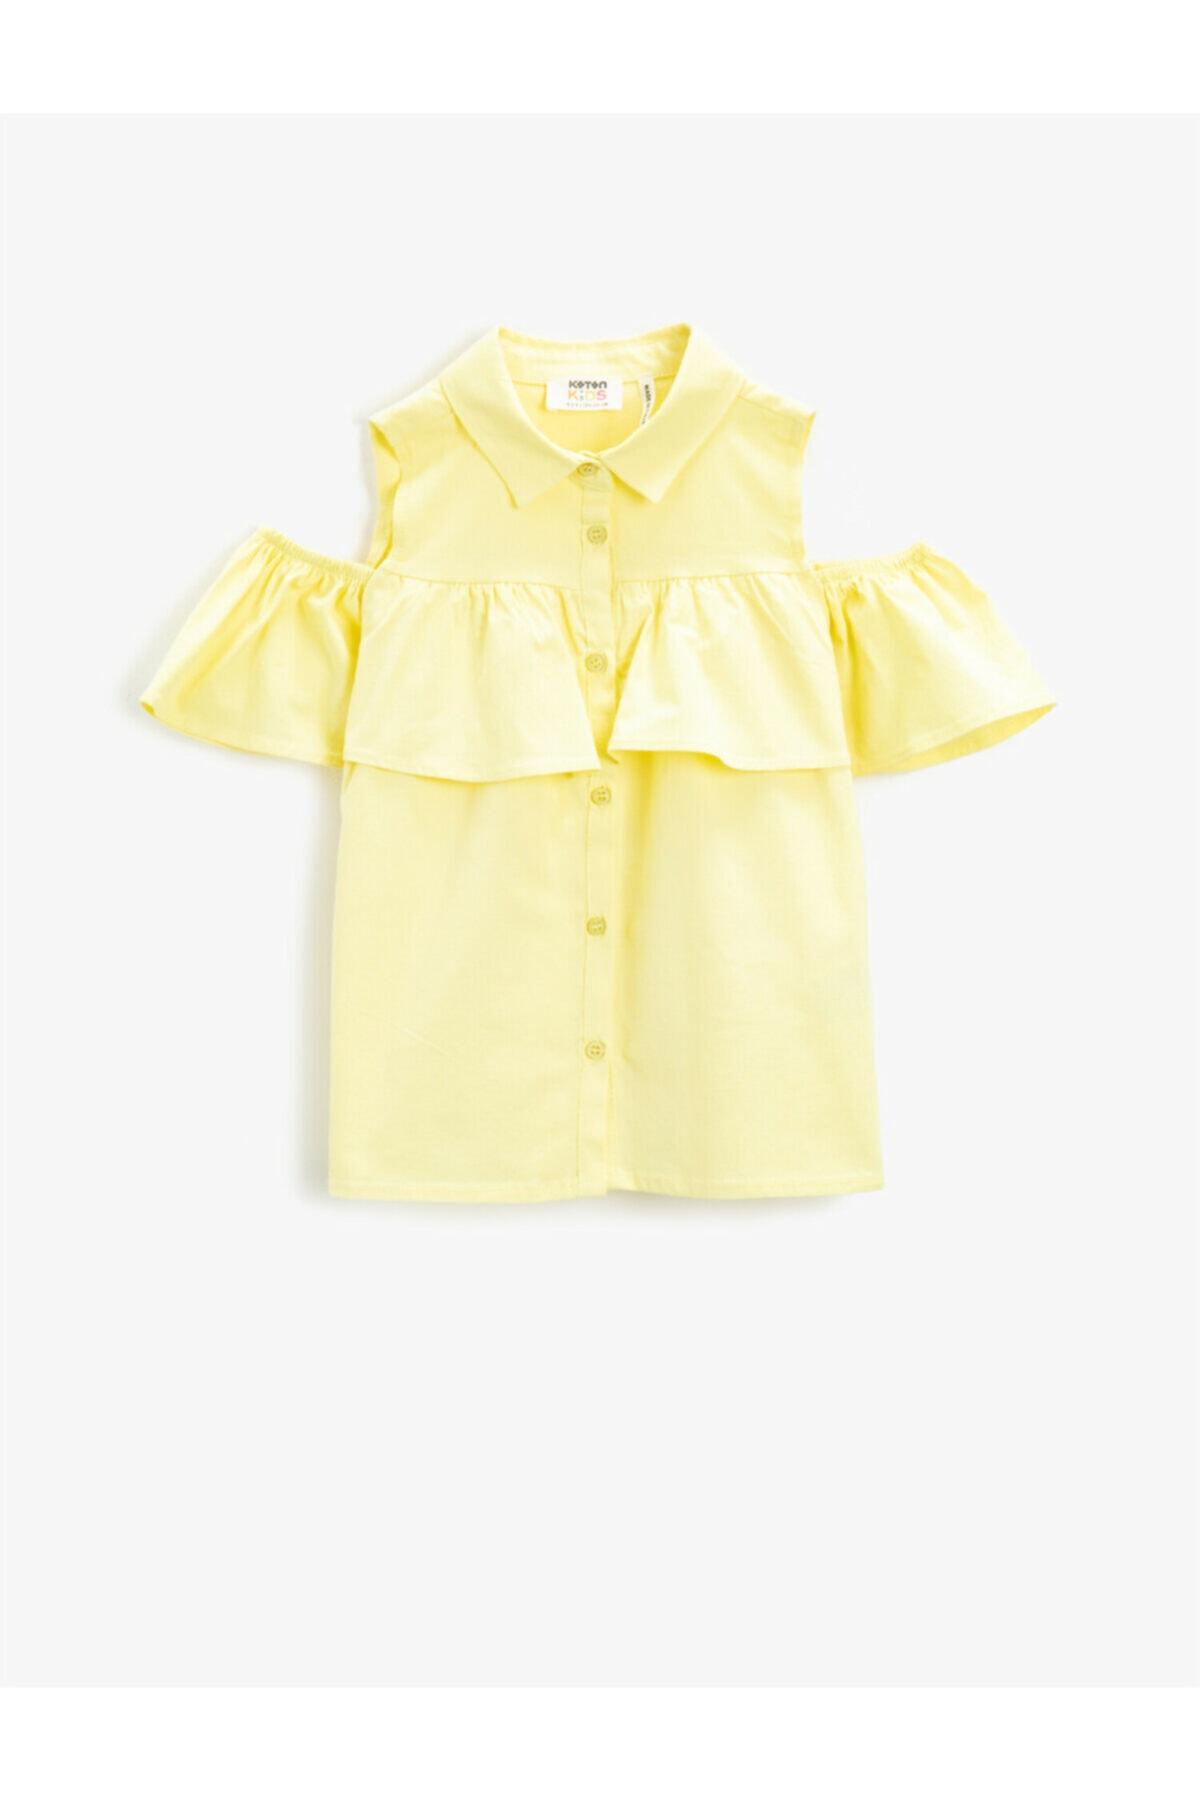 شومیز نوزاد دختر کوتاه برند کوتون رنگ زرد ty96132598